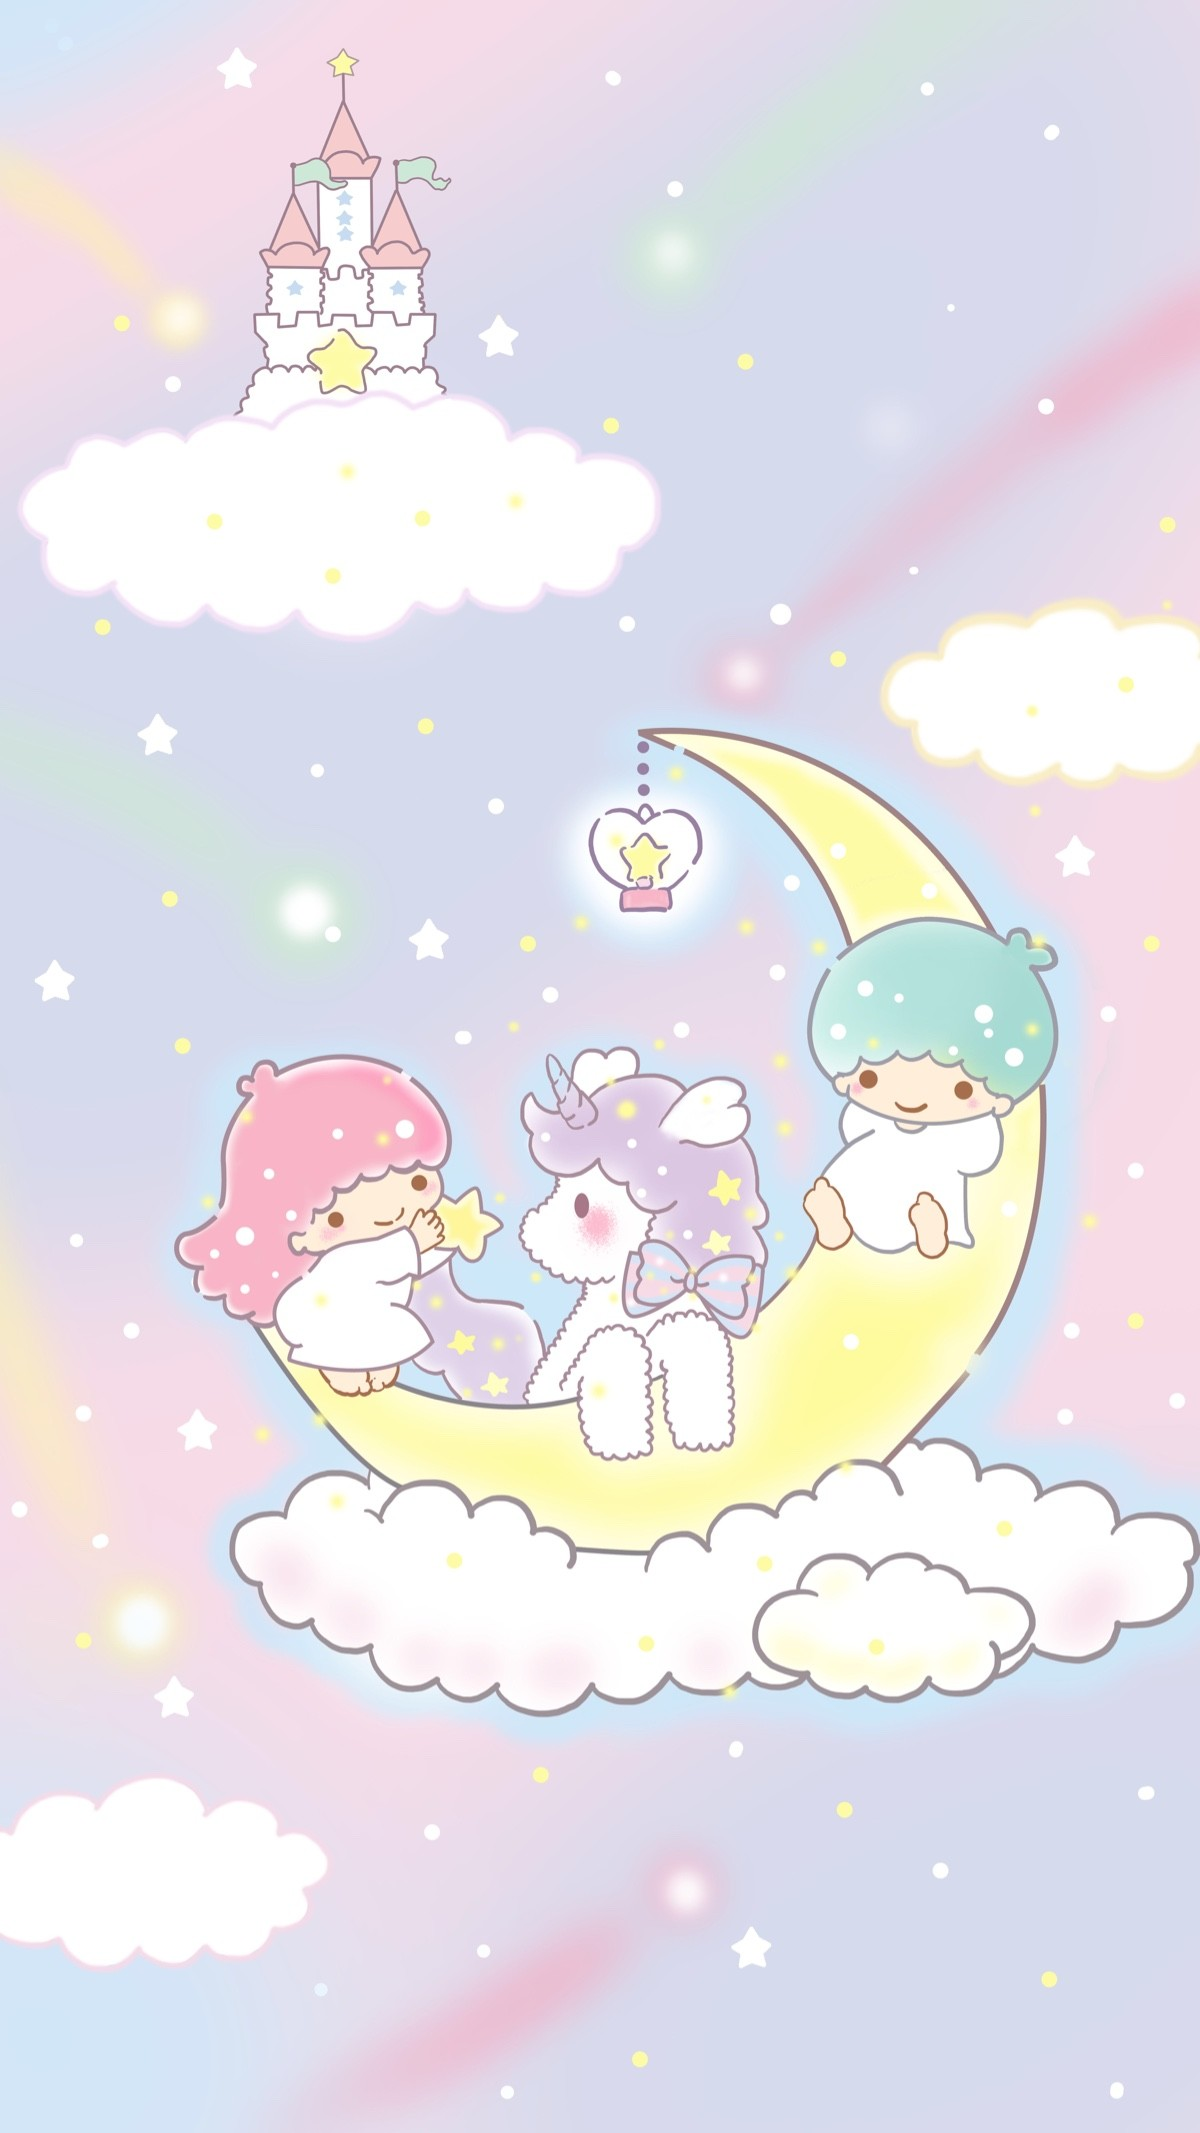 Sanrio Background (54+ images)